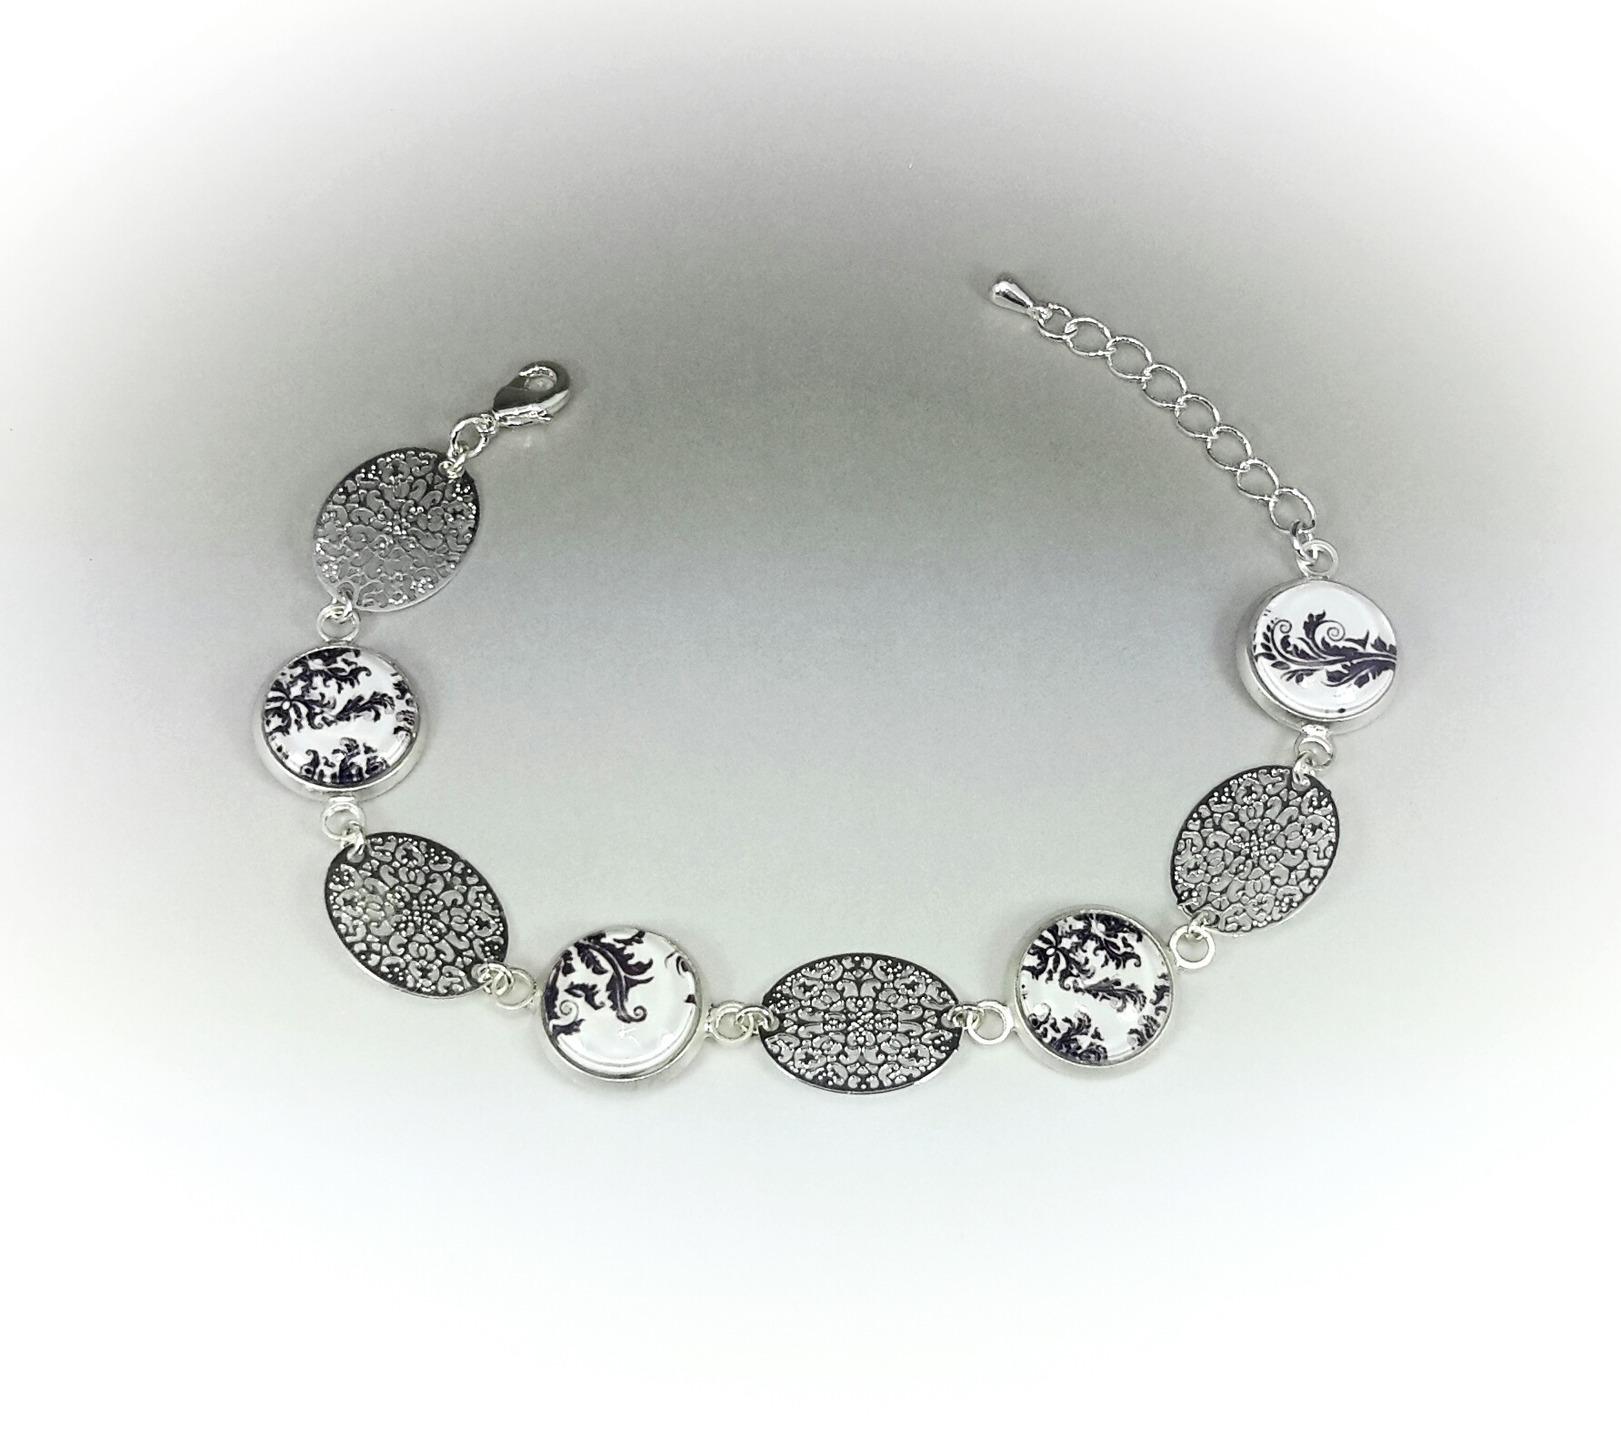 bracelet-bracelet-multi-cabochons-victorine-17304880-img-20160205-16f81f-52698_big